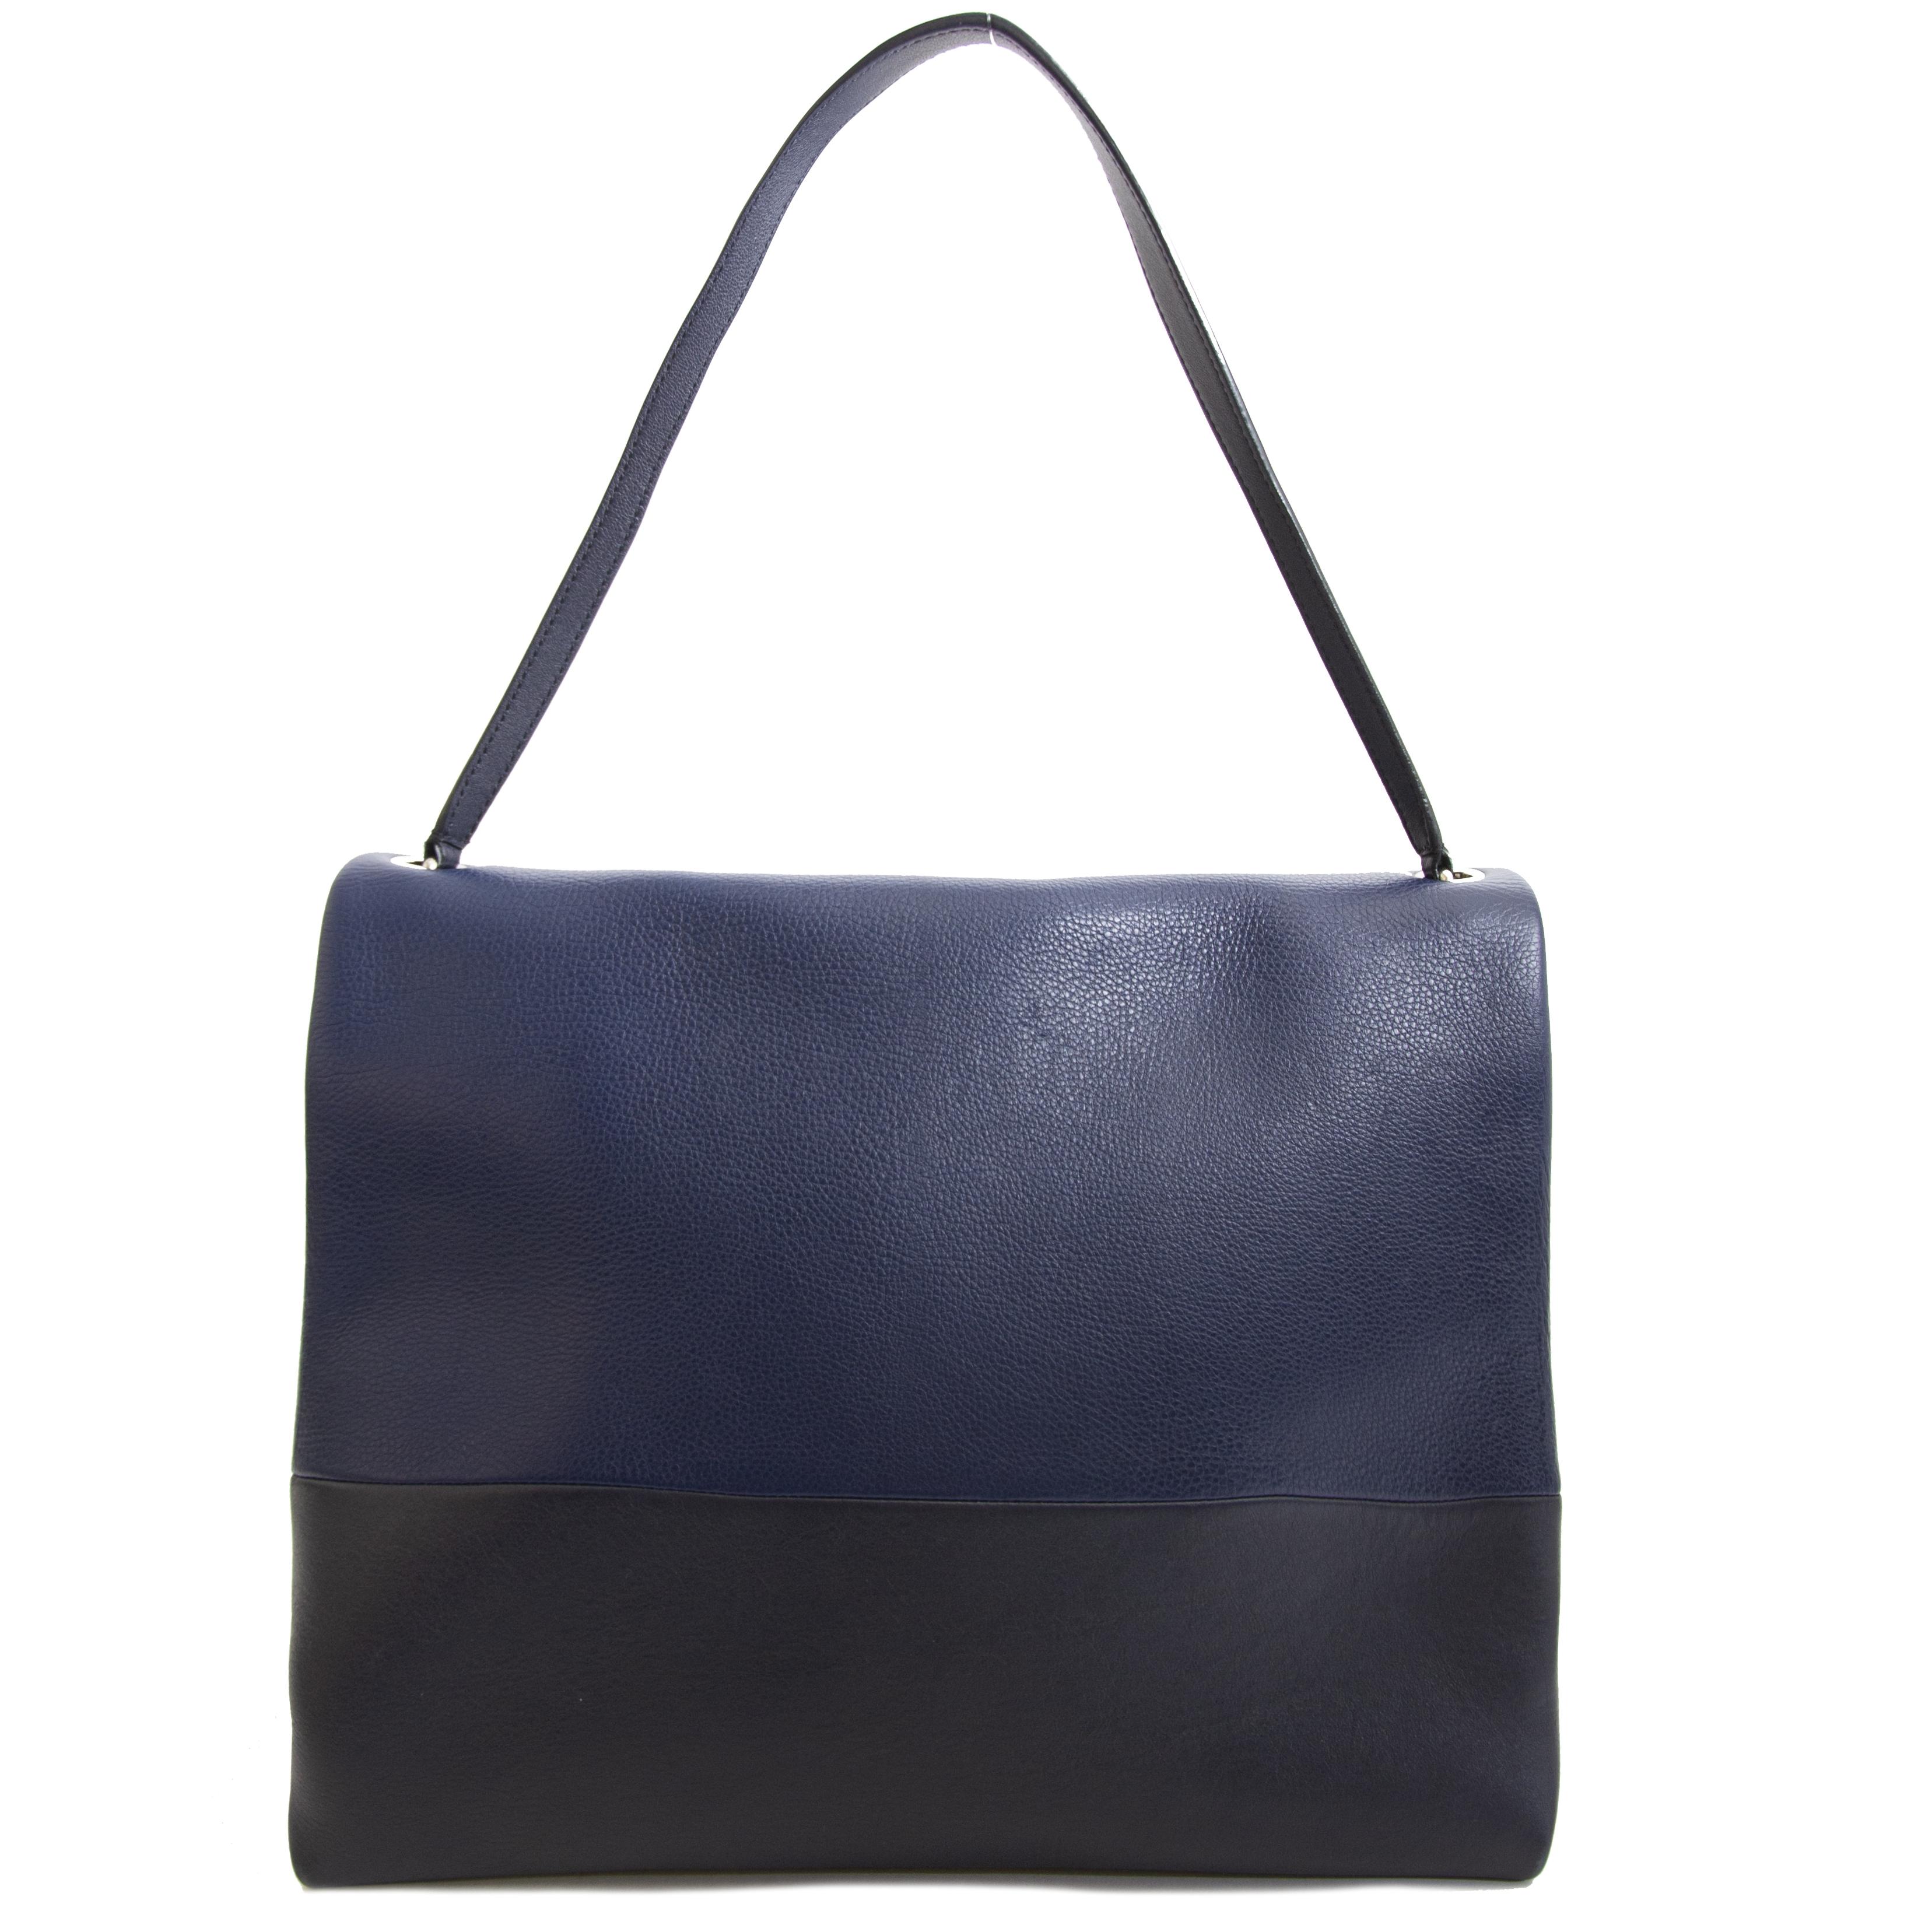 Authentic secondhand Celine Duotone Shoulderbag LabelLOV right price online shopping LabelLOV